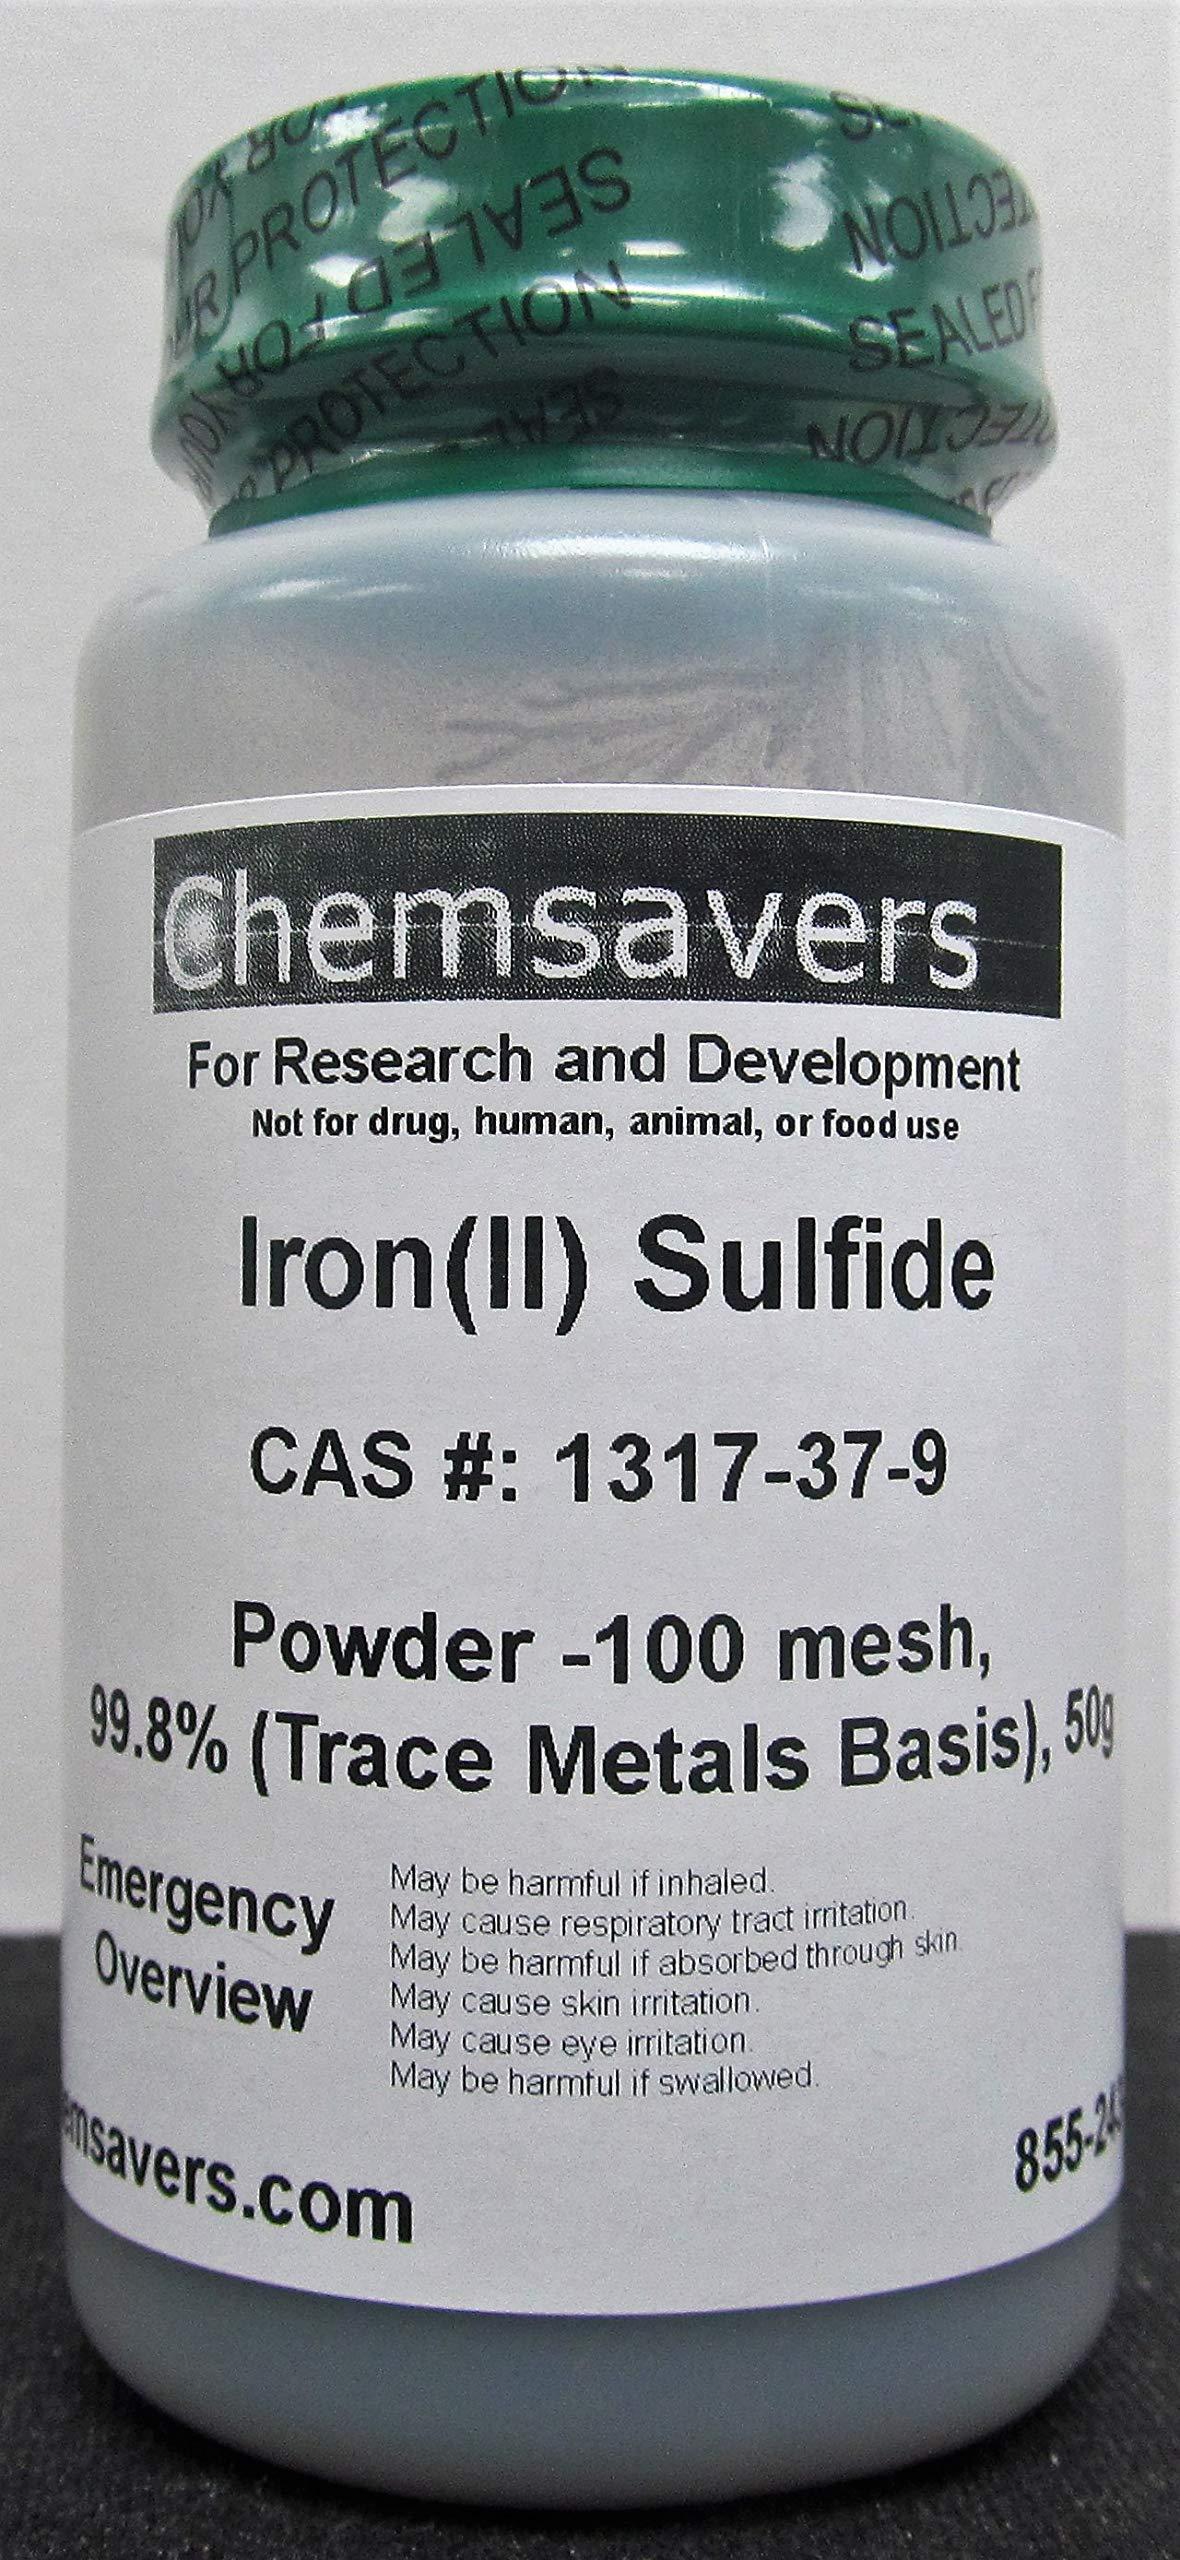 Iron(II) Sulfide, Powder -100 mesh, 99.8% (Trace Metals Basis), 50g by Chemsavers (Image #1)